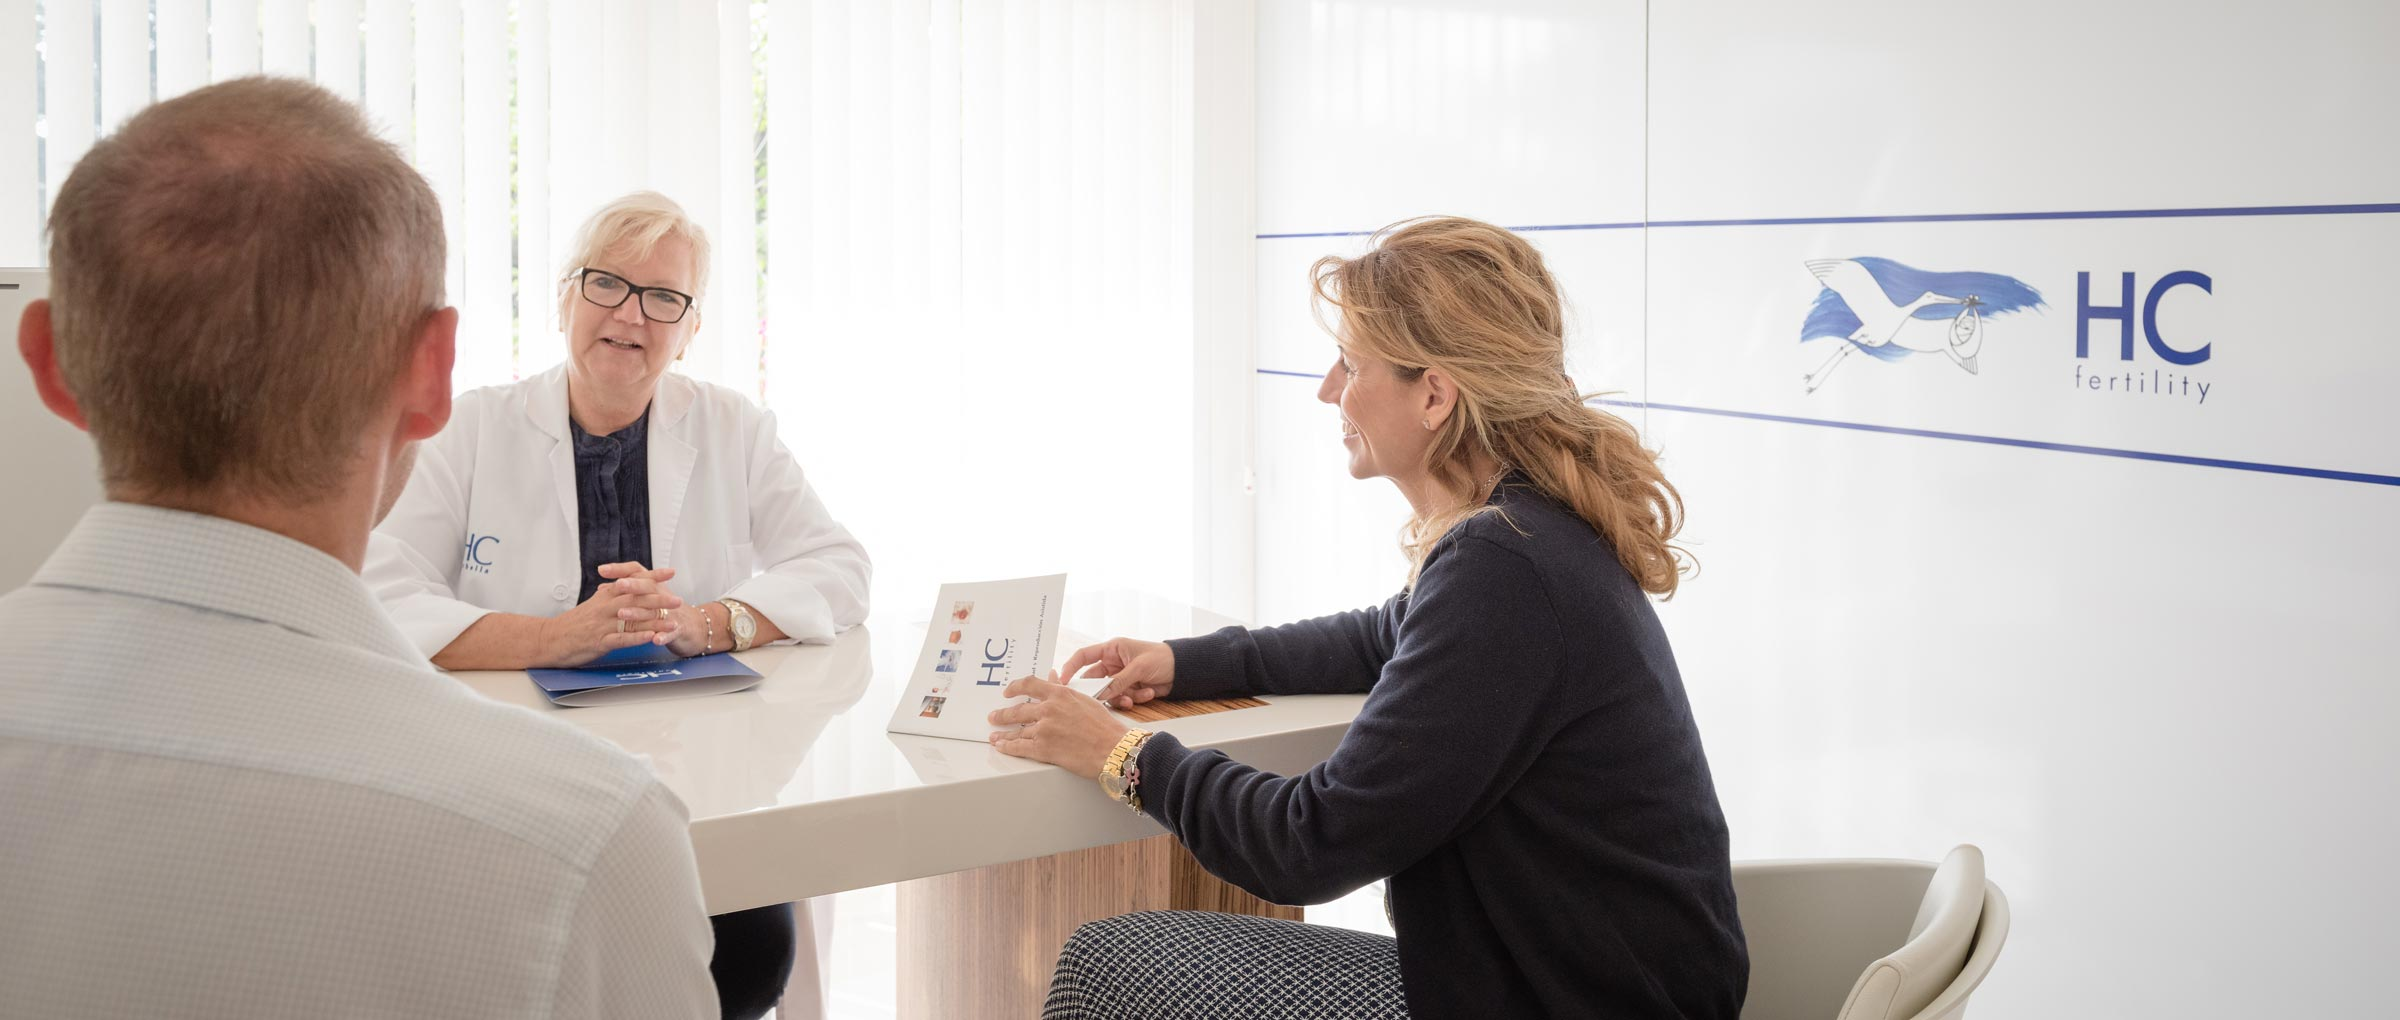 consulta Hospital-HC